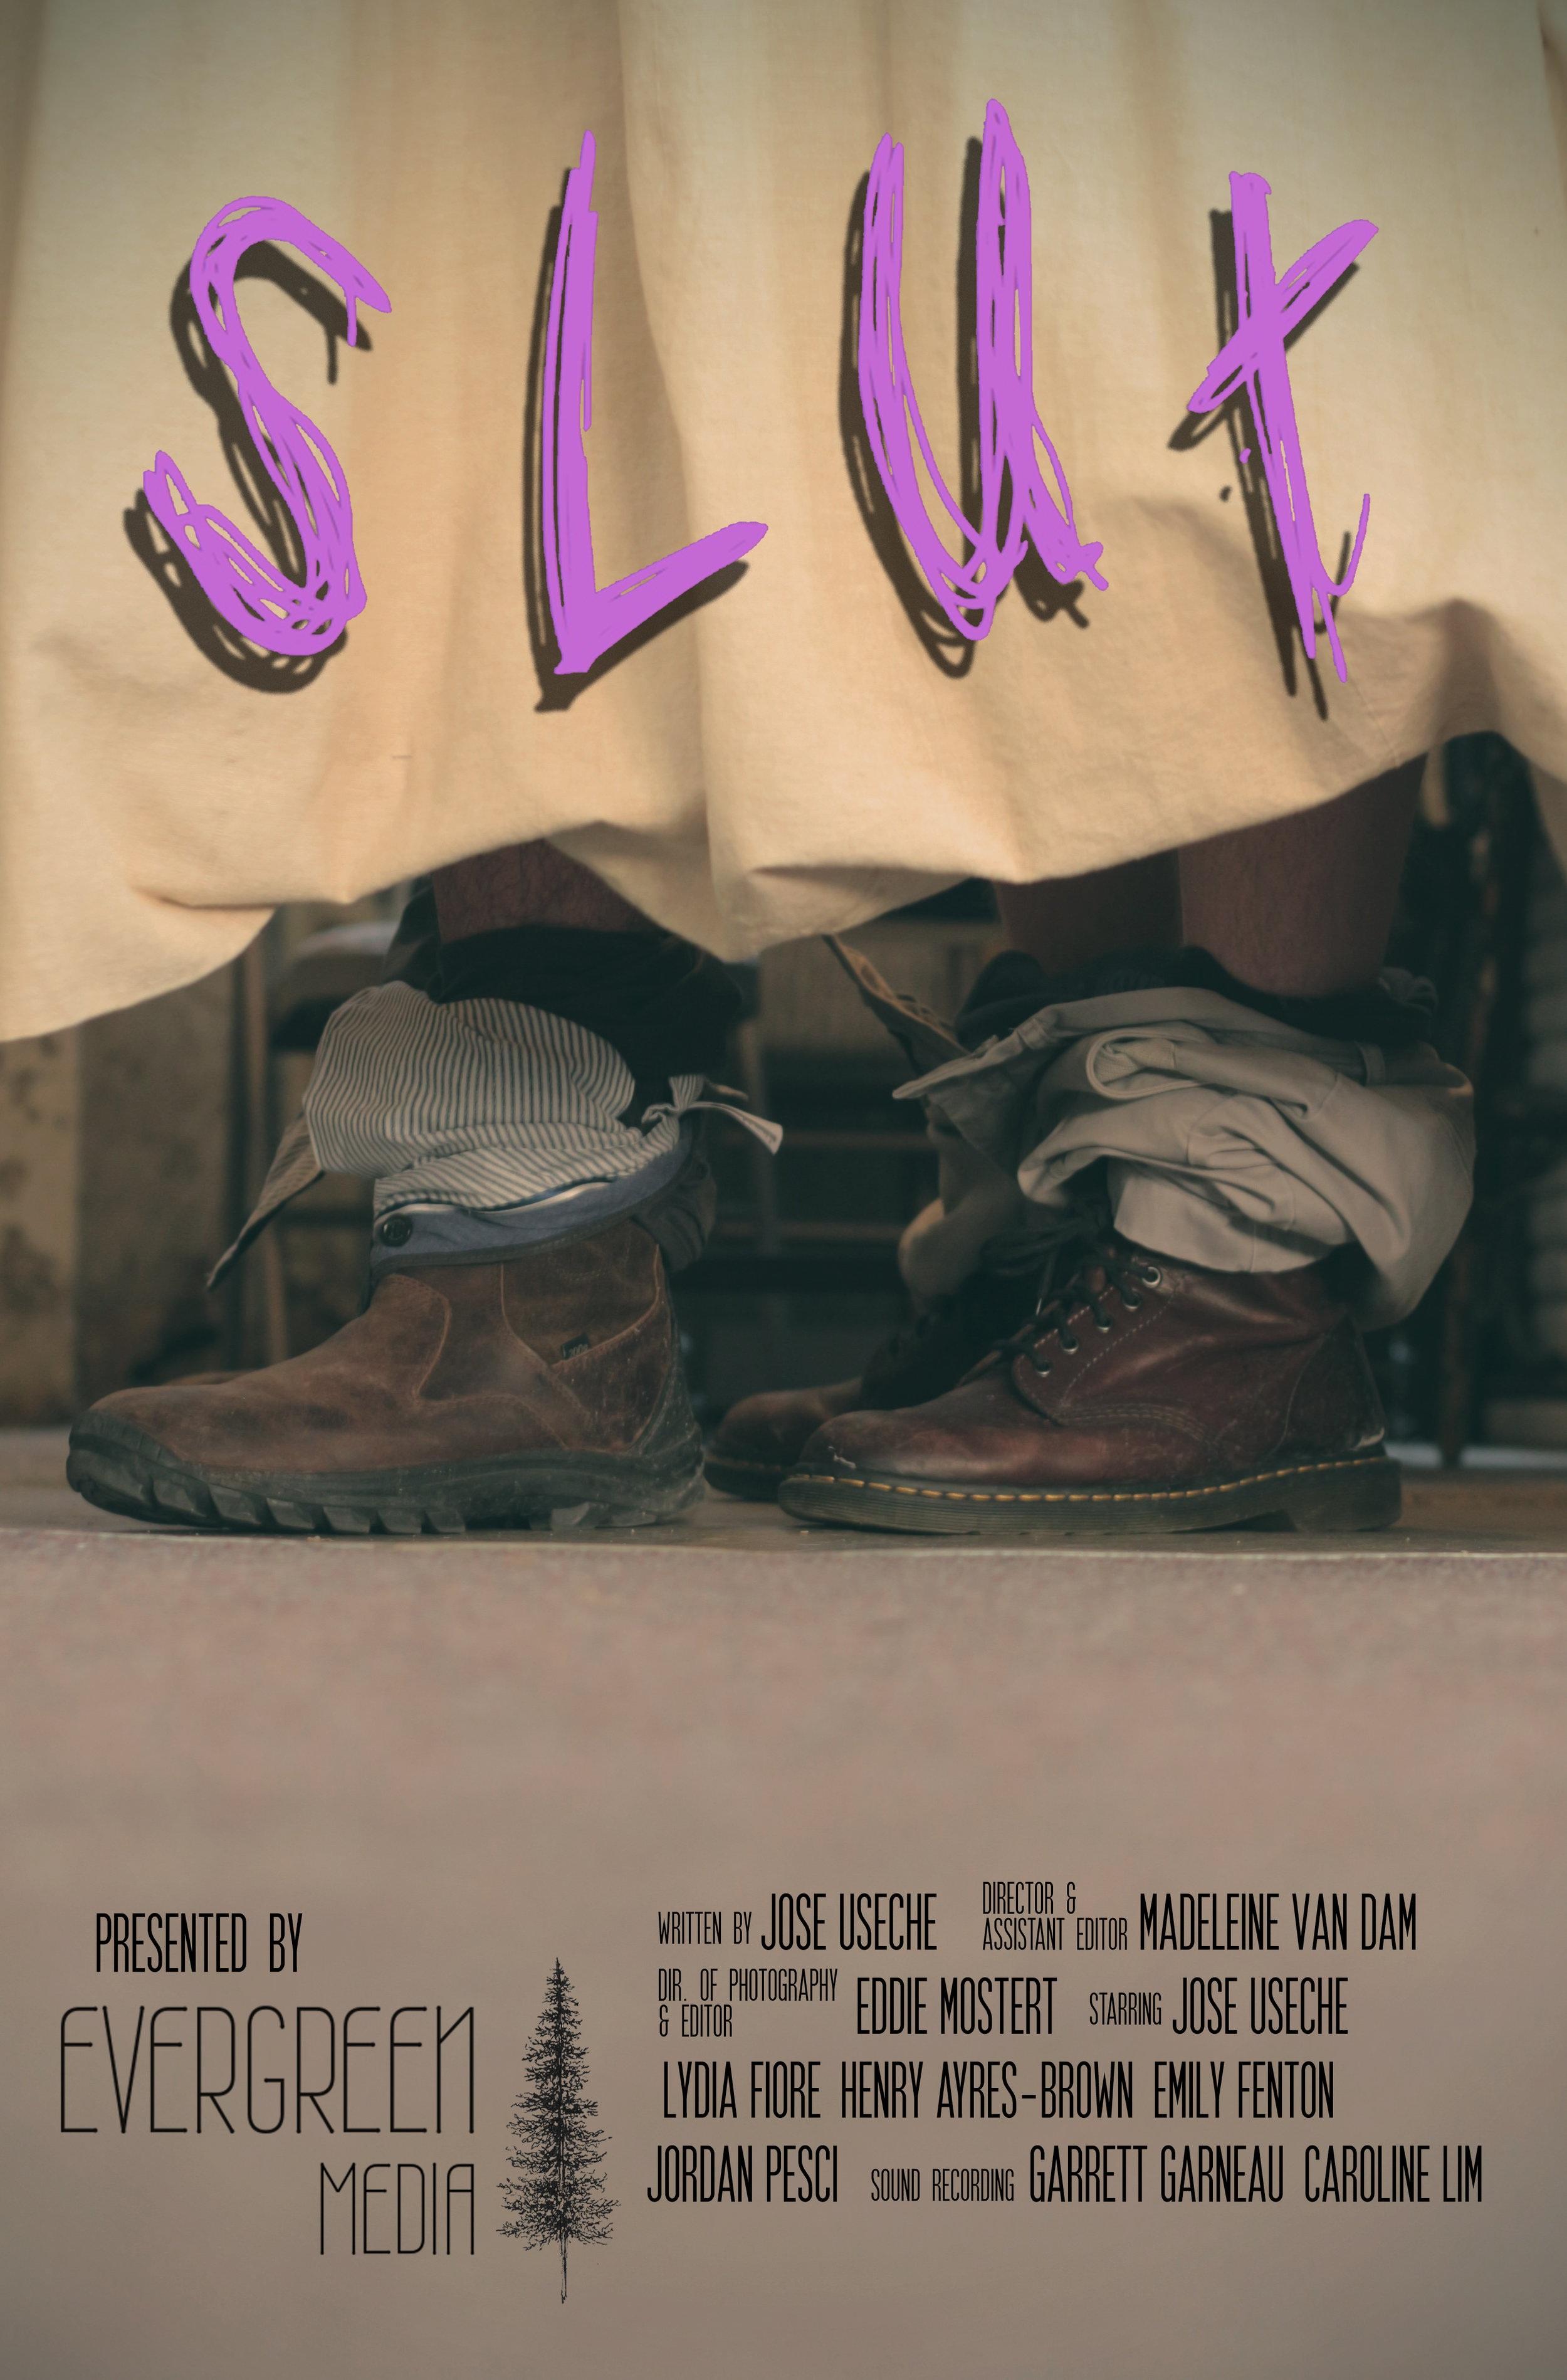 SLUT+movie+poster_final+%281%29+%281%29.jpg